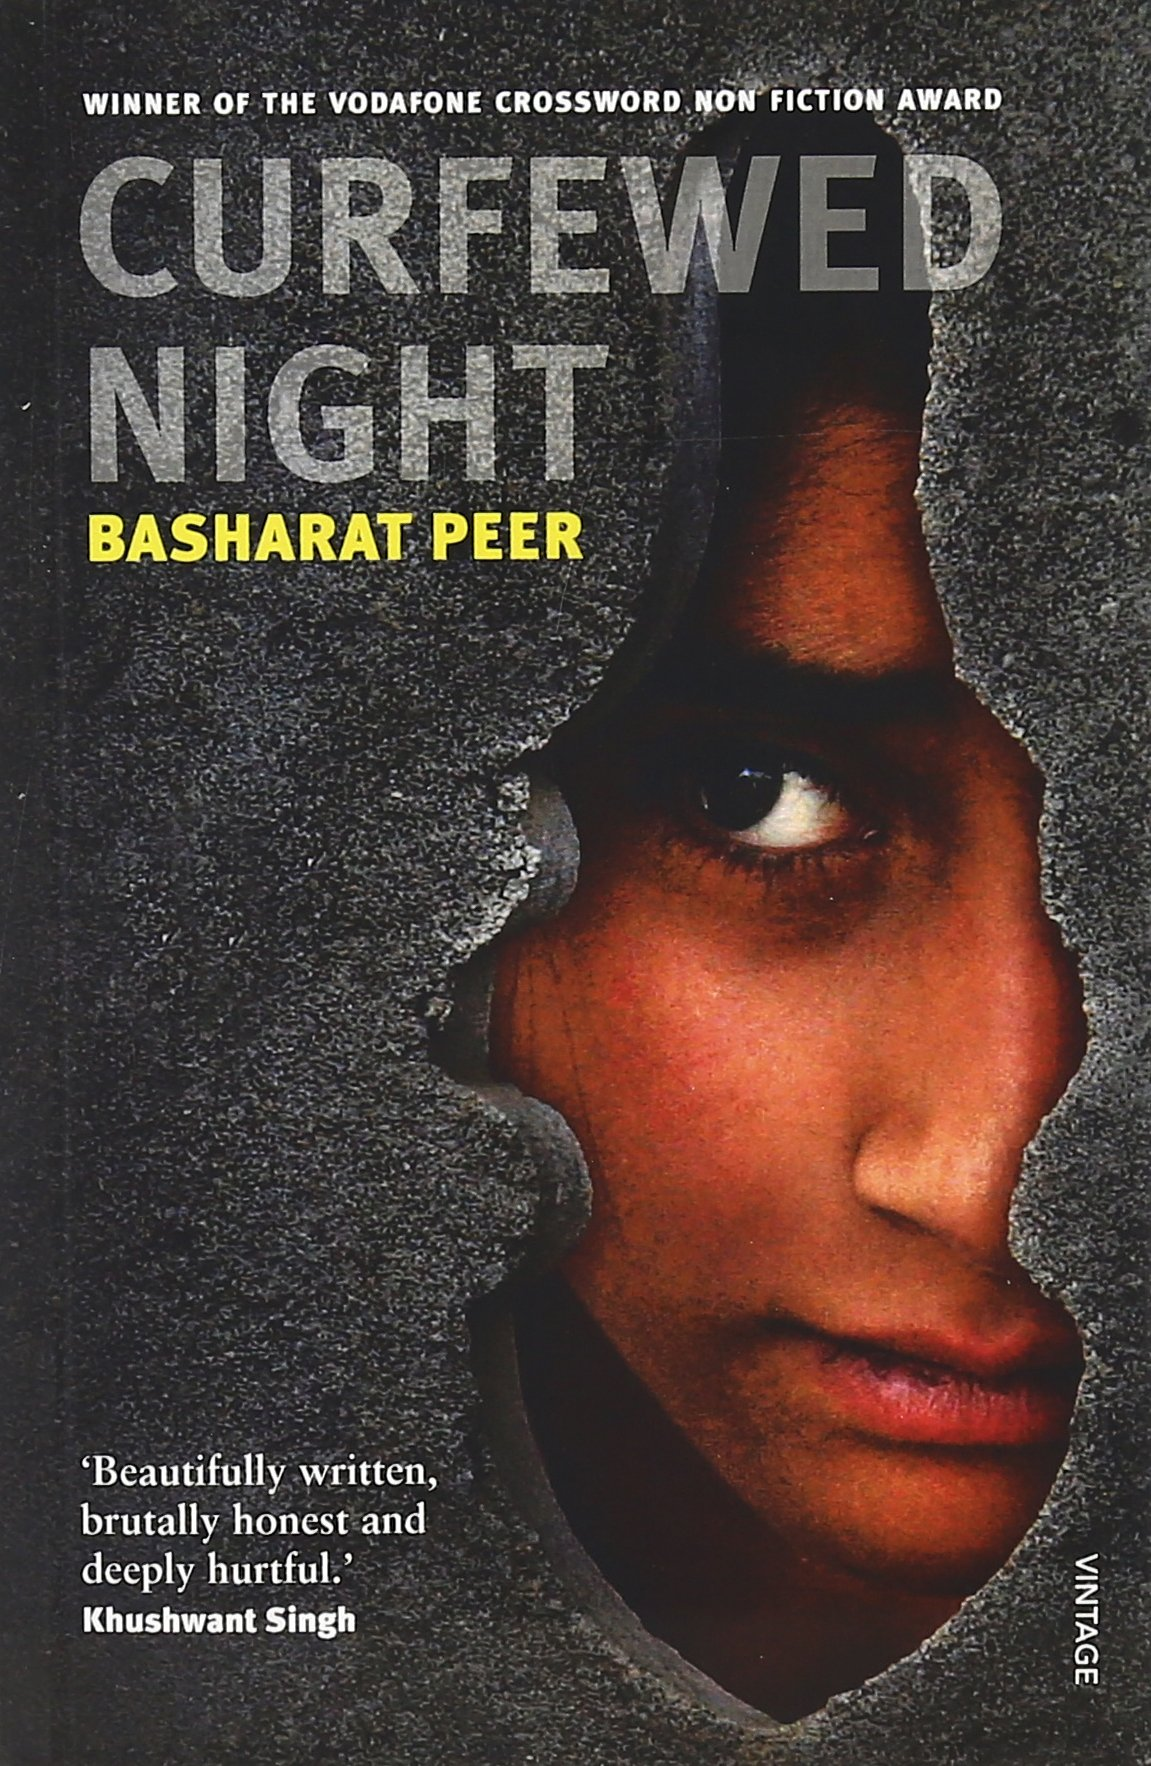 basharat peer curfewd night